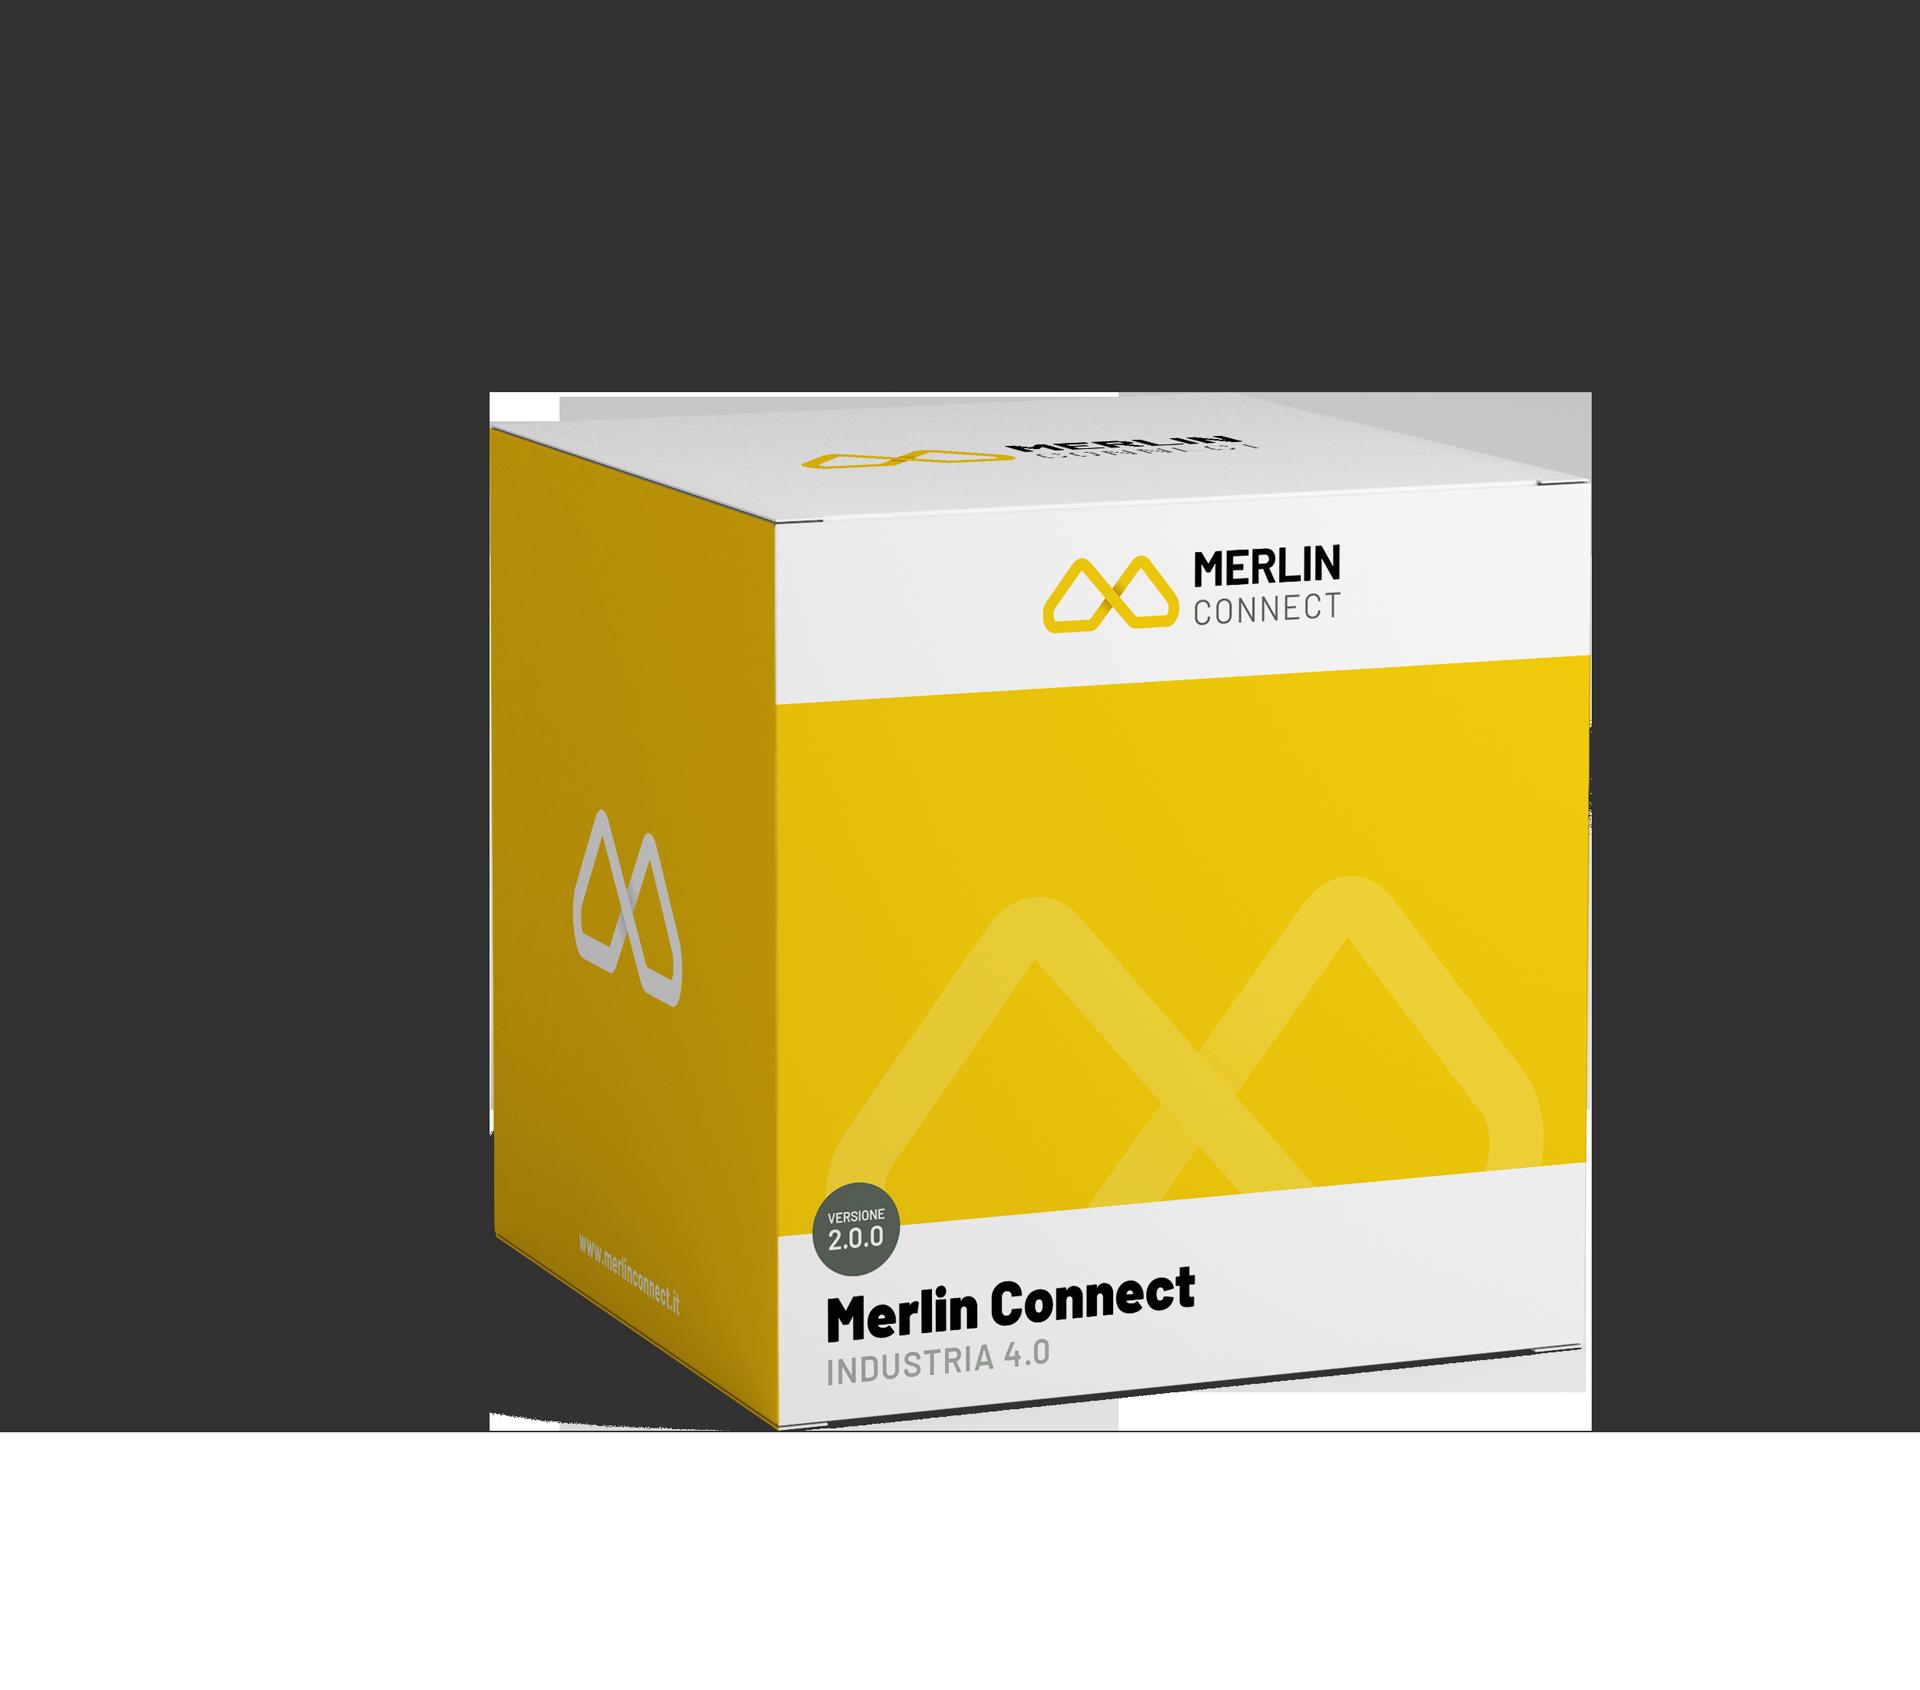 merlin connect software per industria 4.0